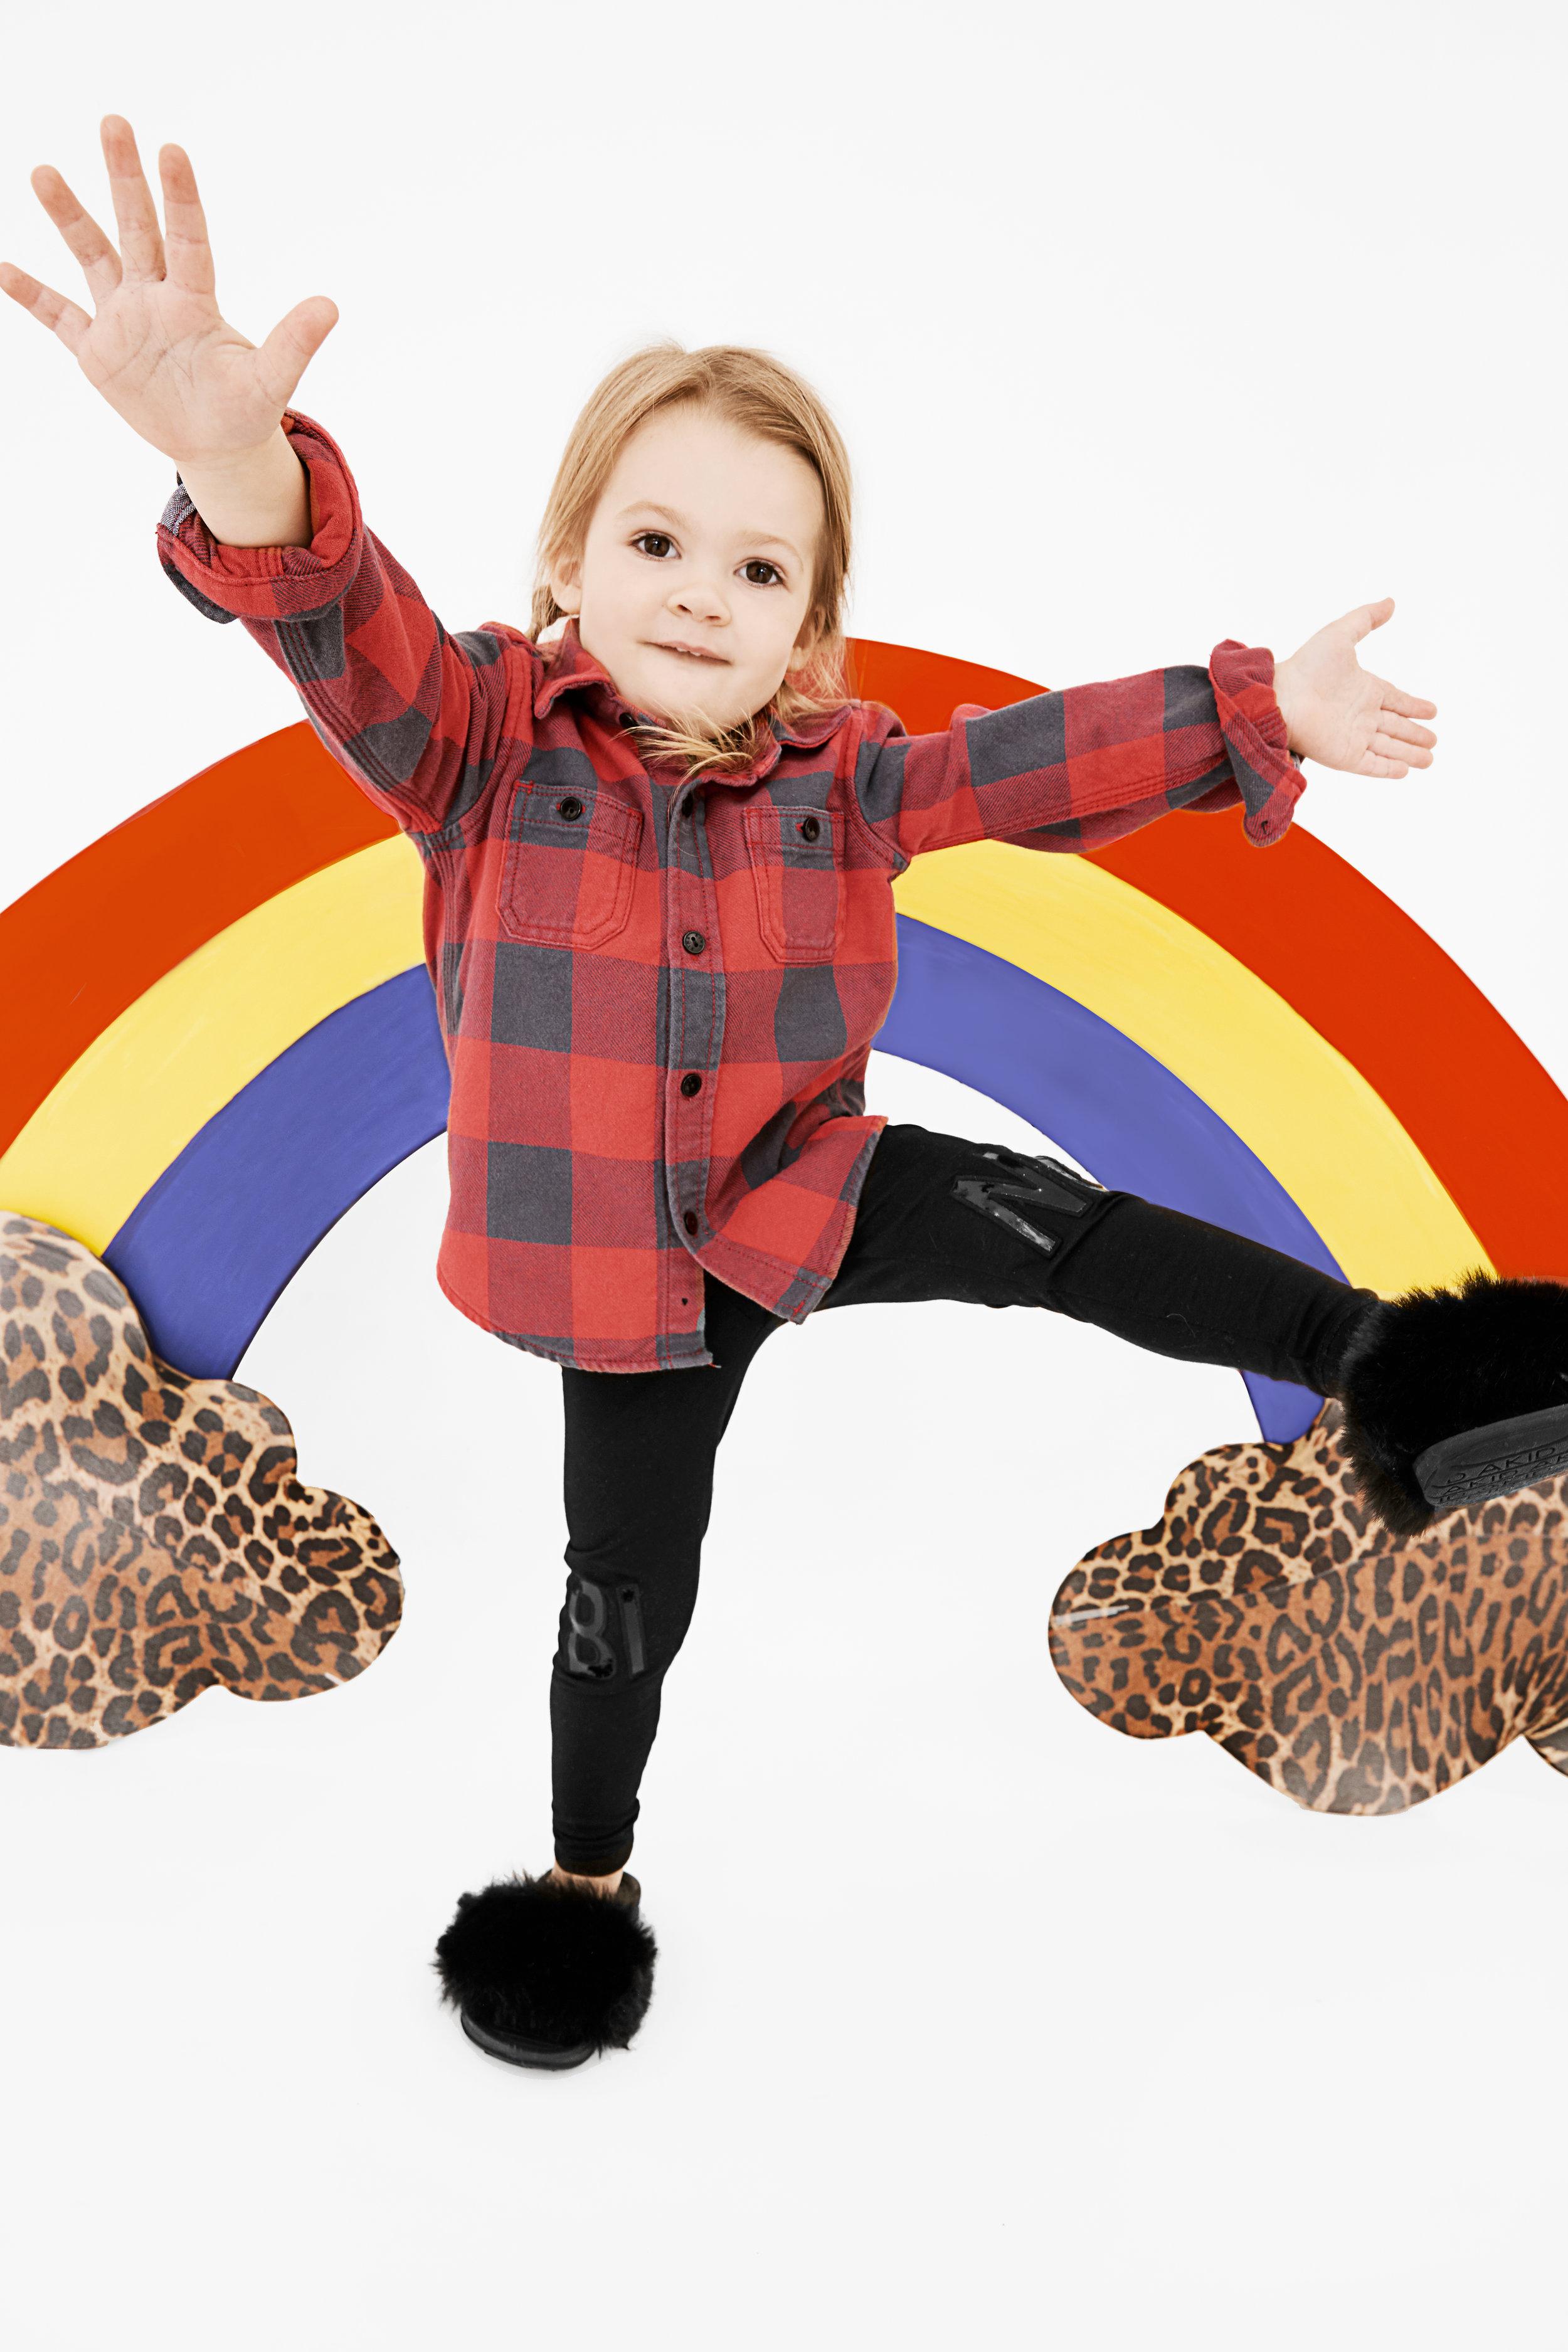 BING-KIDS-MILLIE-FLANNEL-SHIRT-BK45-001-05_0960.jpg